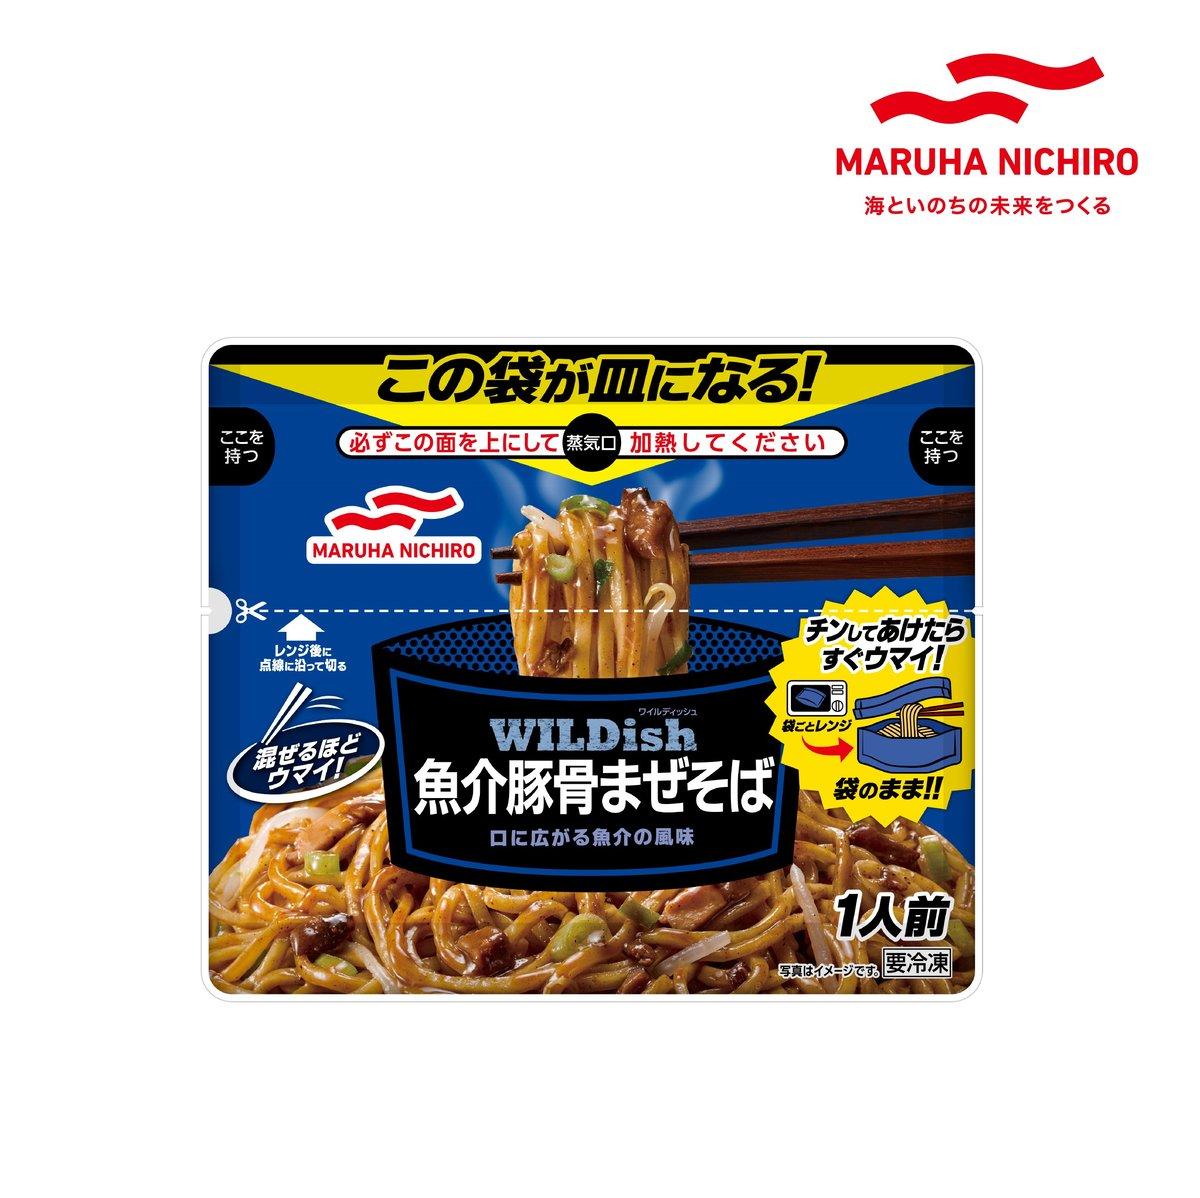 Maruha Nichiro日本魚介豚骨汁炒麵 250g